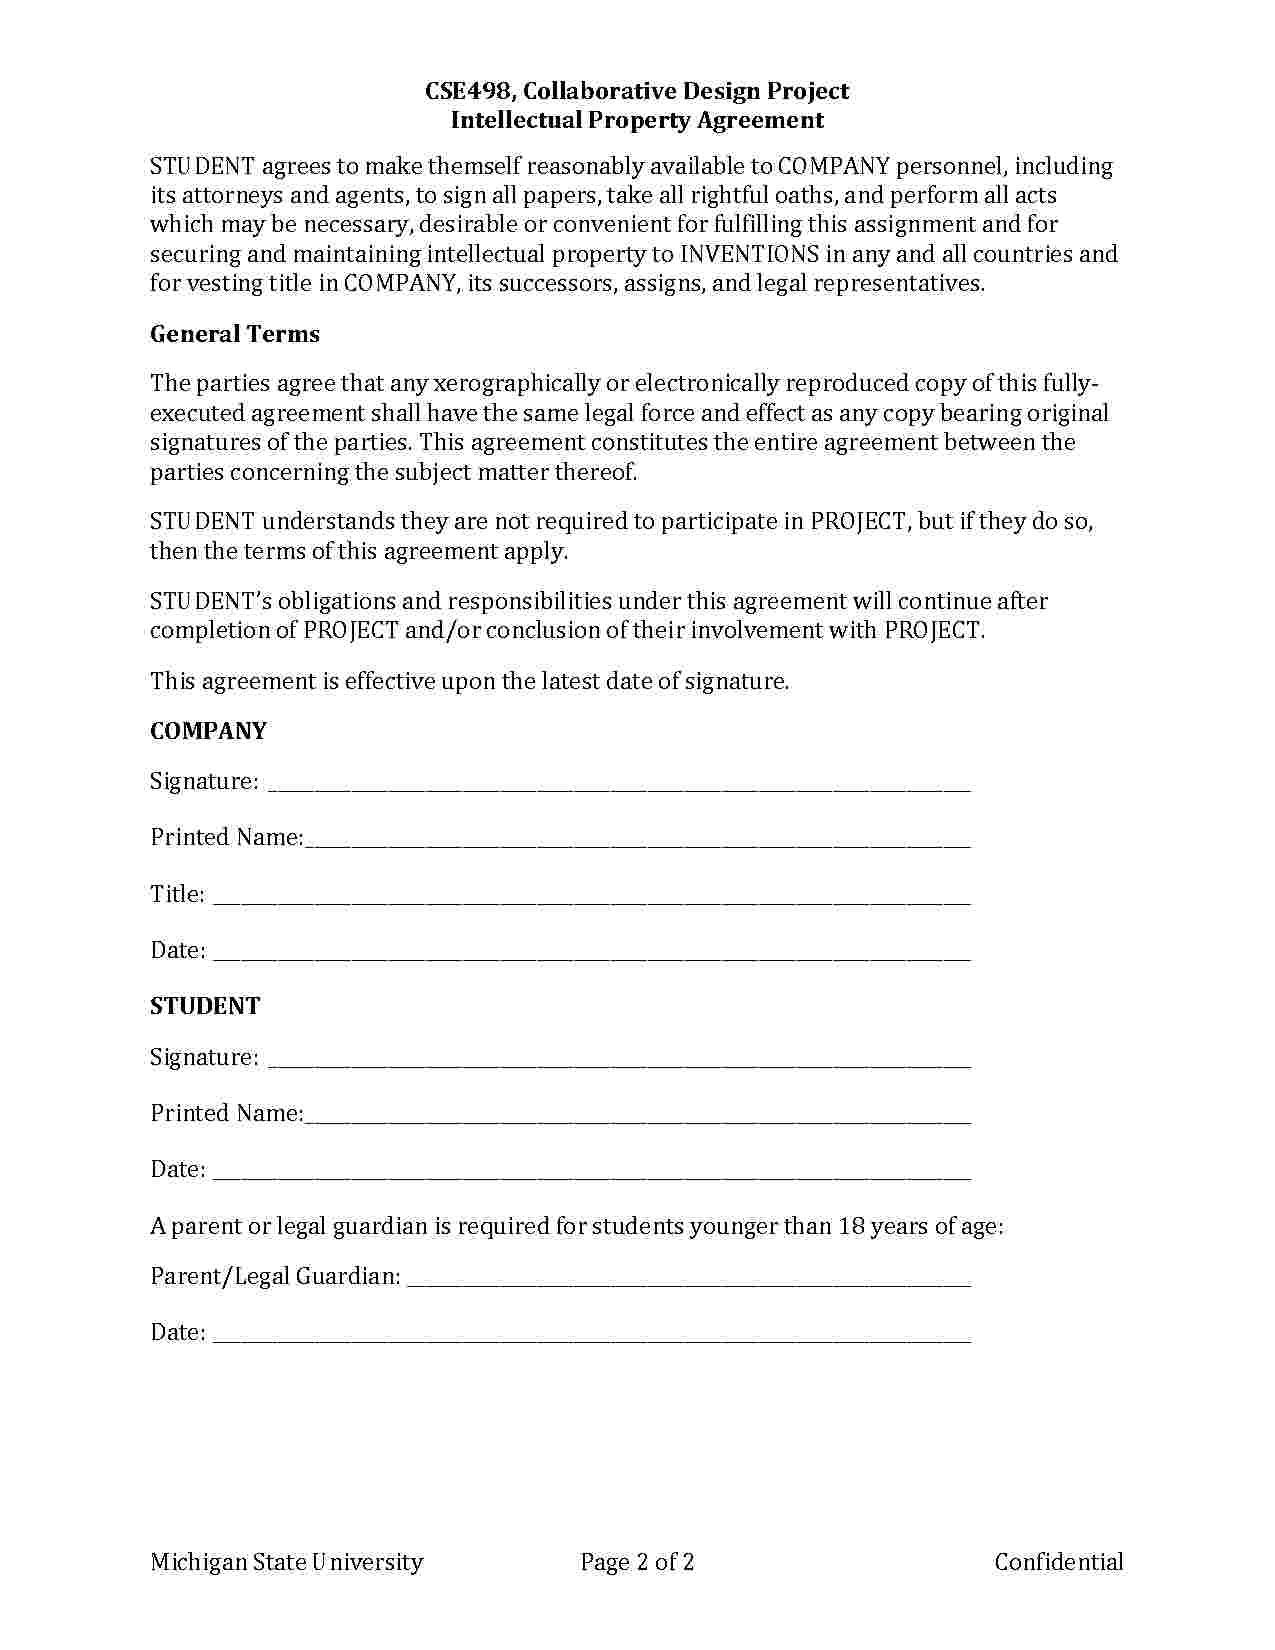 Trademark Assignment Agreement Agreement Assignments